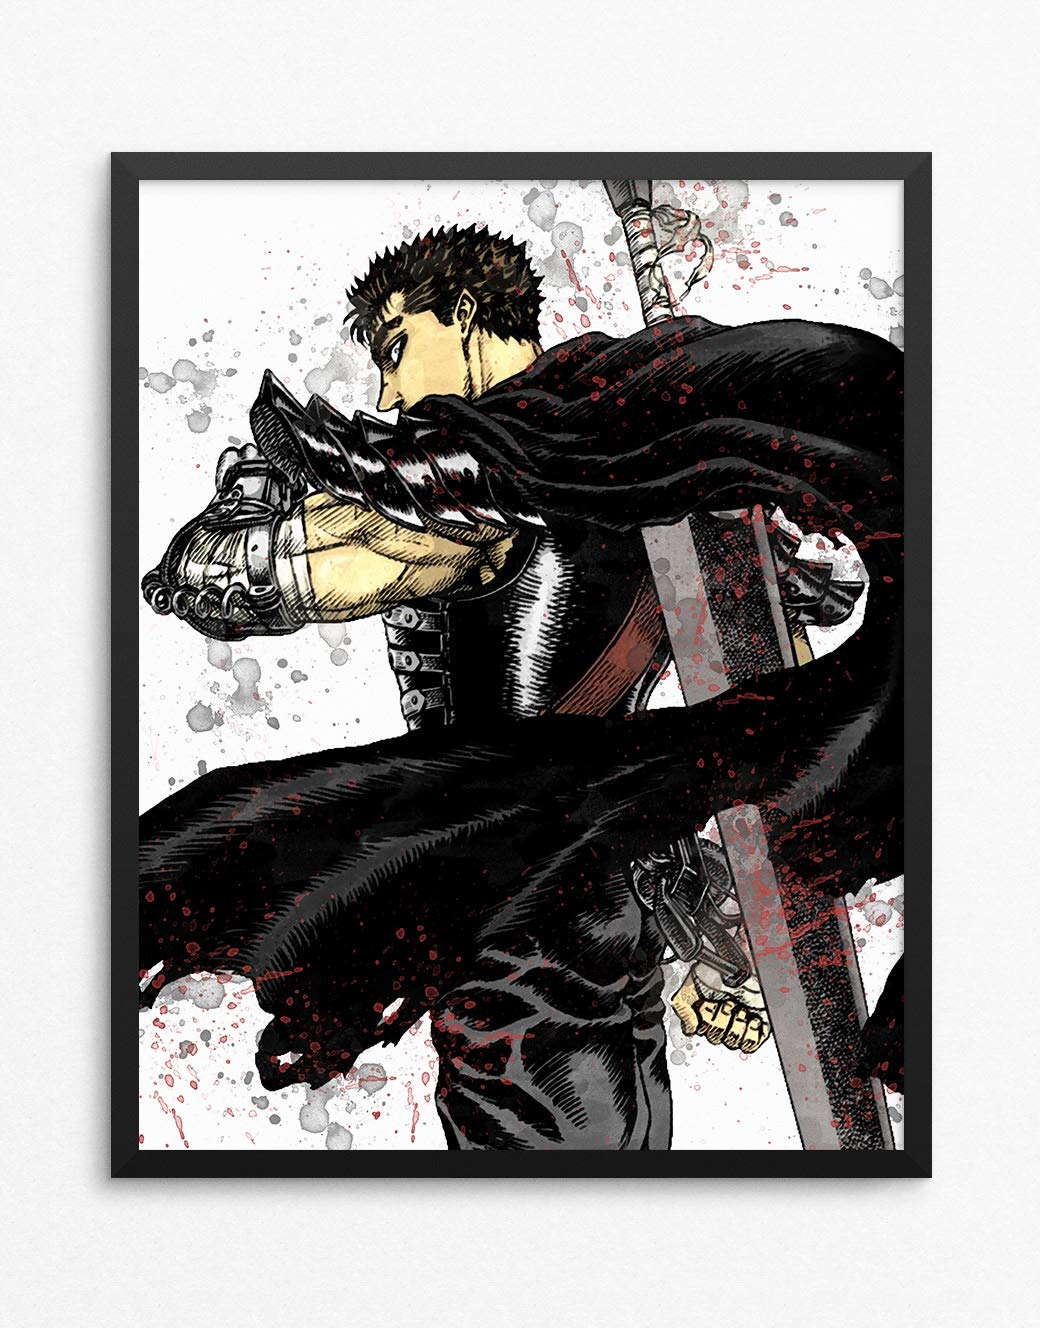 Amazon com berserk print guts poster berserk poster guts print anime print watercolor n 002 16 x 20 inch posters prints